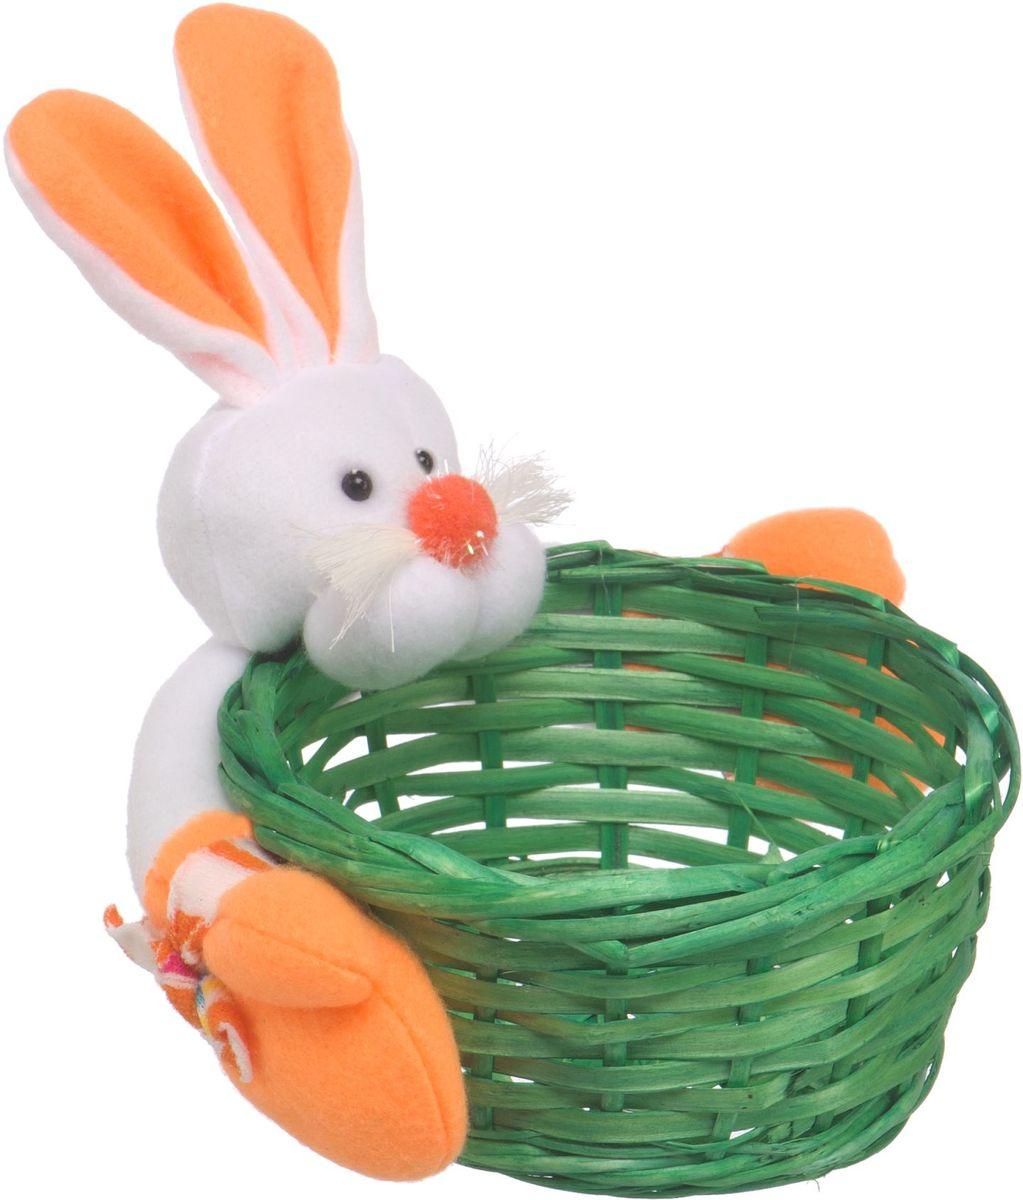 Корзина стеллажная Natural House Зайчик, цвет: зеленый, 14 x 12 x 7 см корзина складная outwell folding basket цвет зеленый 50 x 29 x 25 см